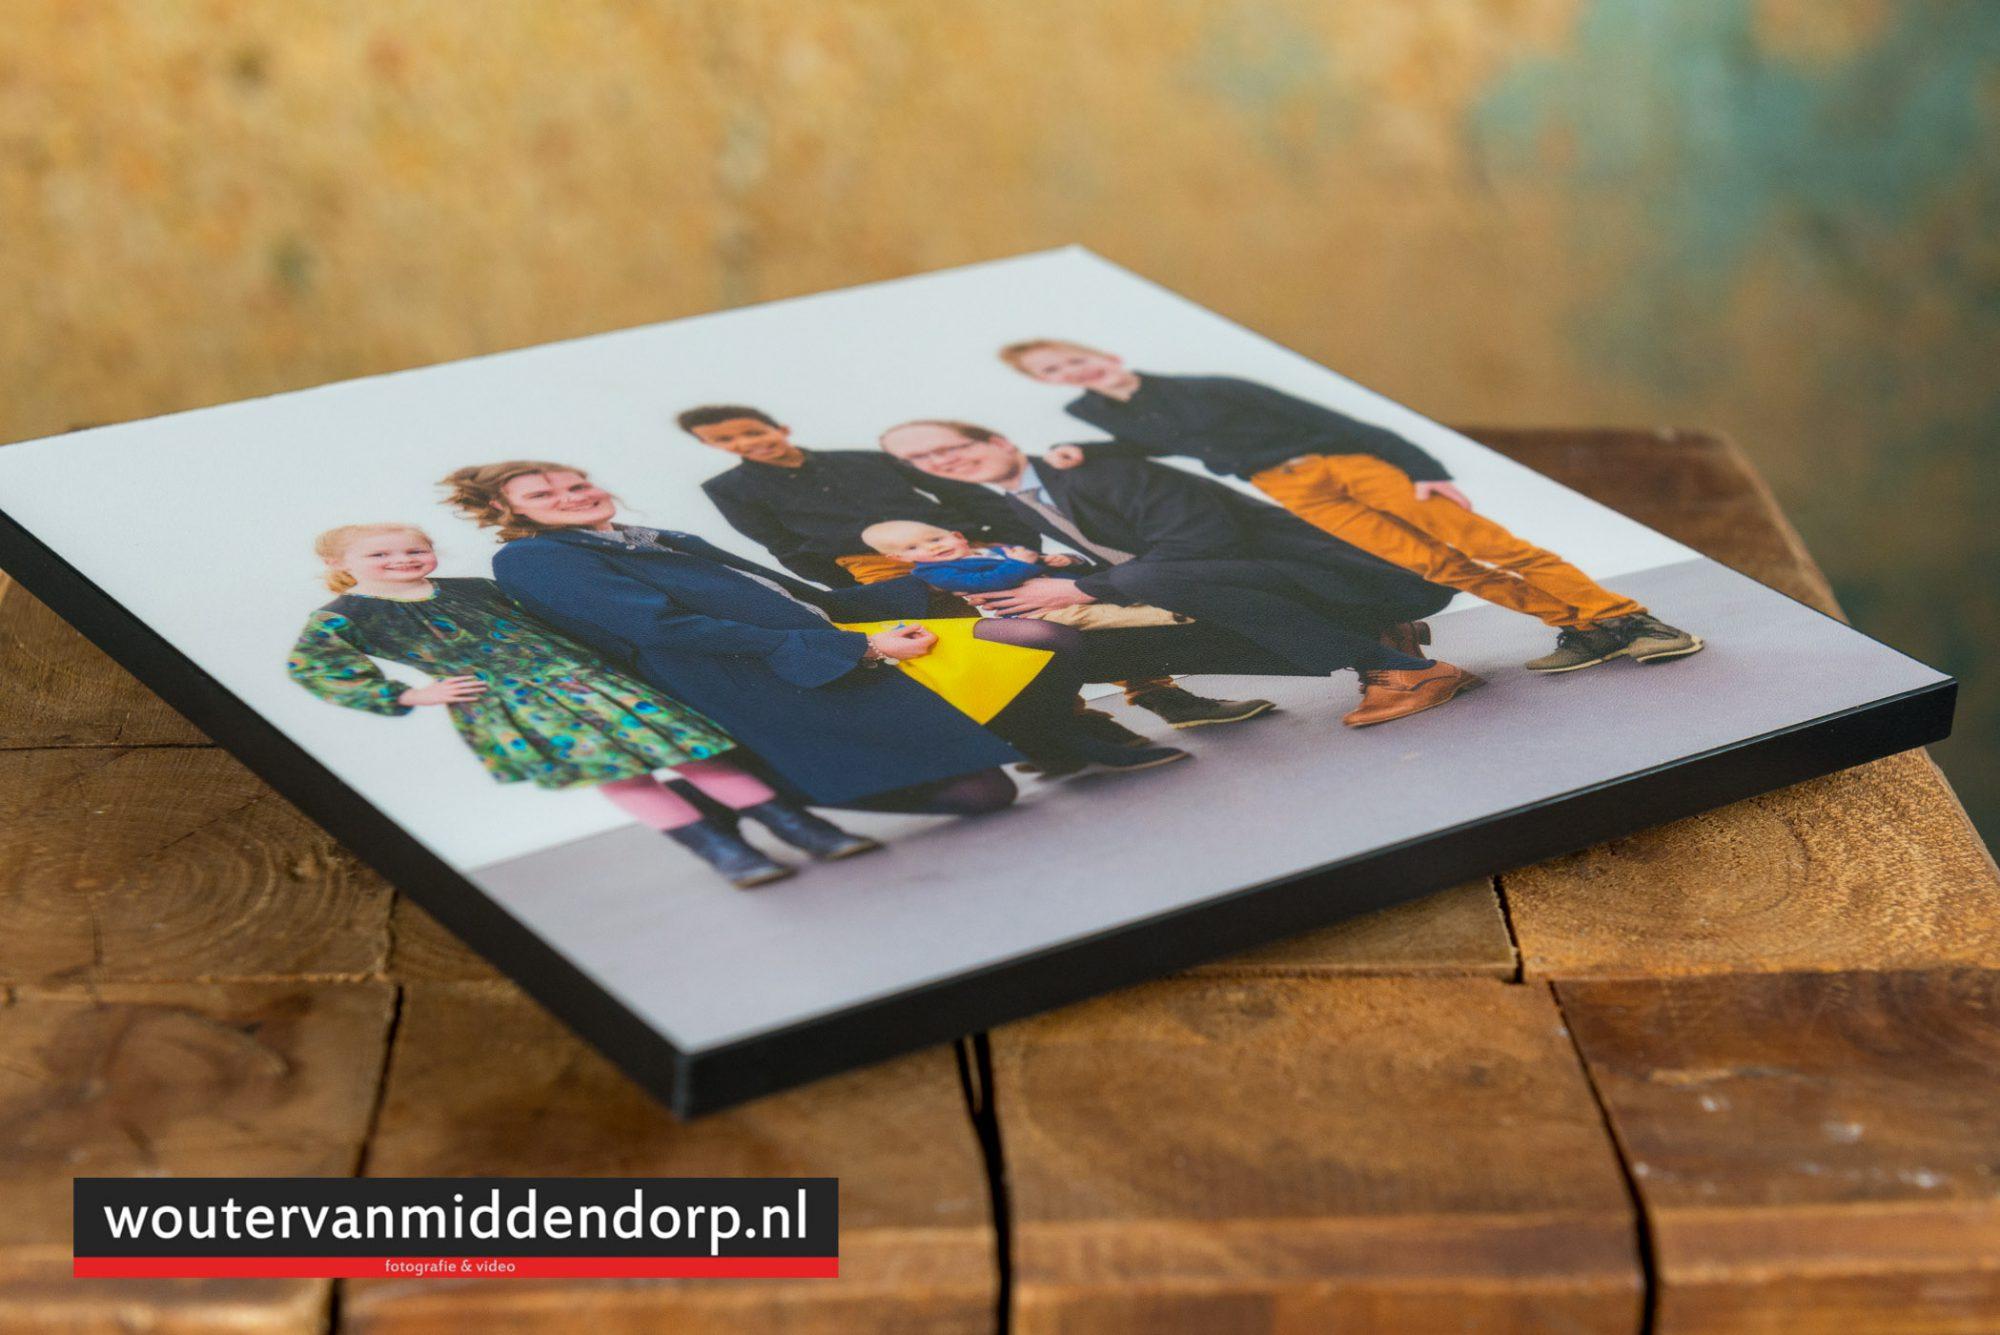 foto op hout Wouter van Middendorp Uddel-11